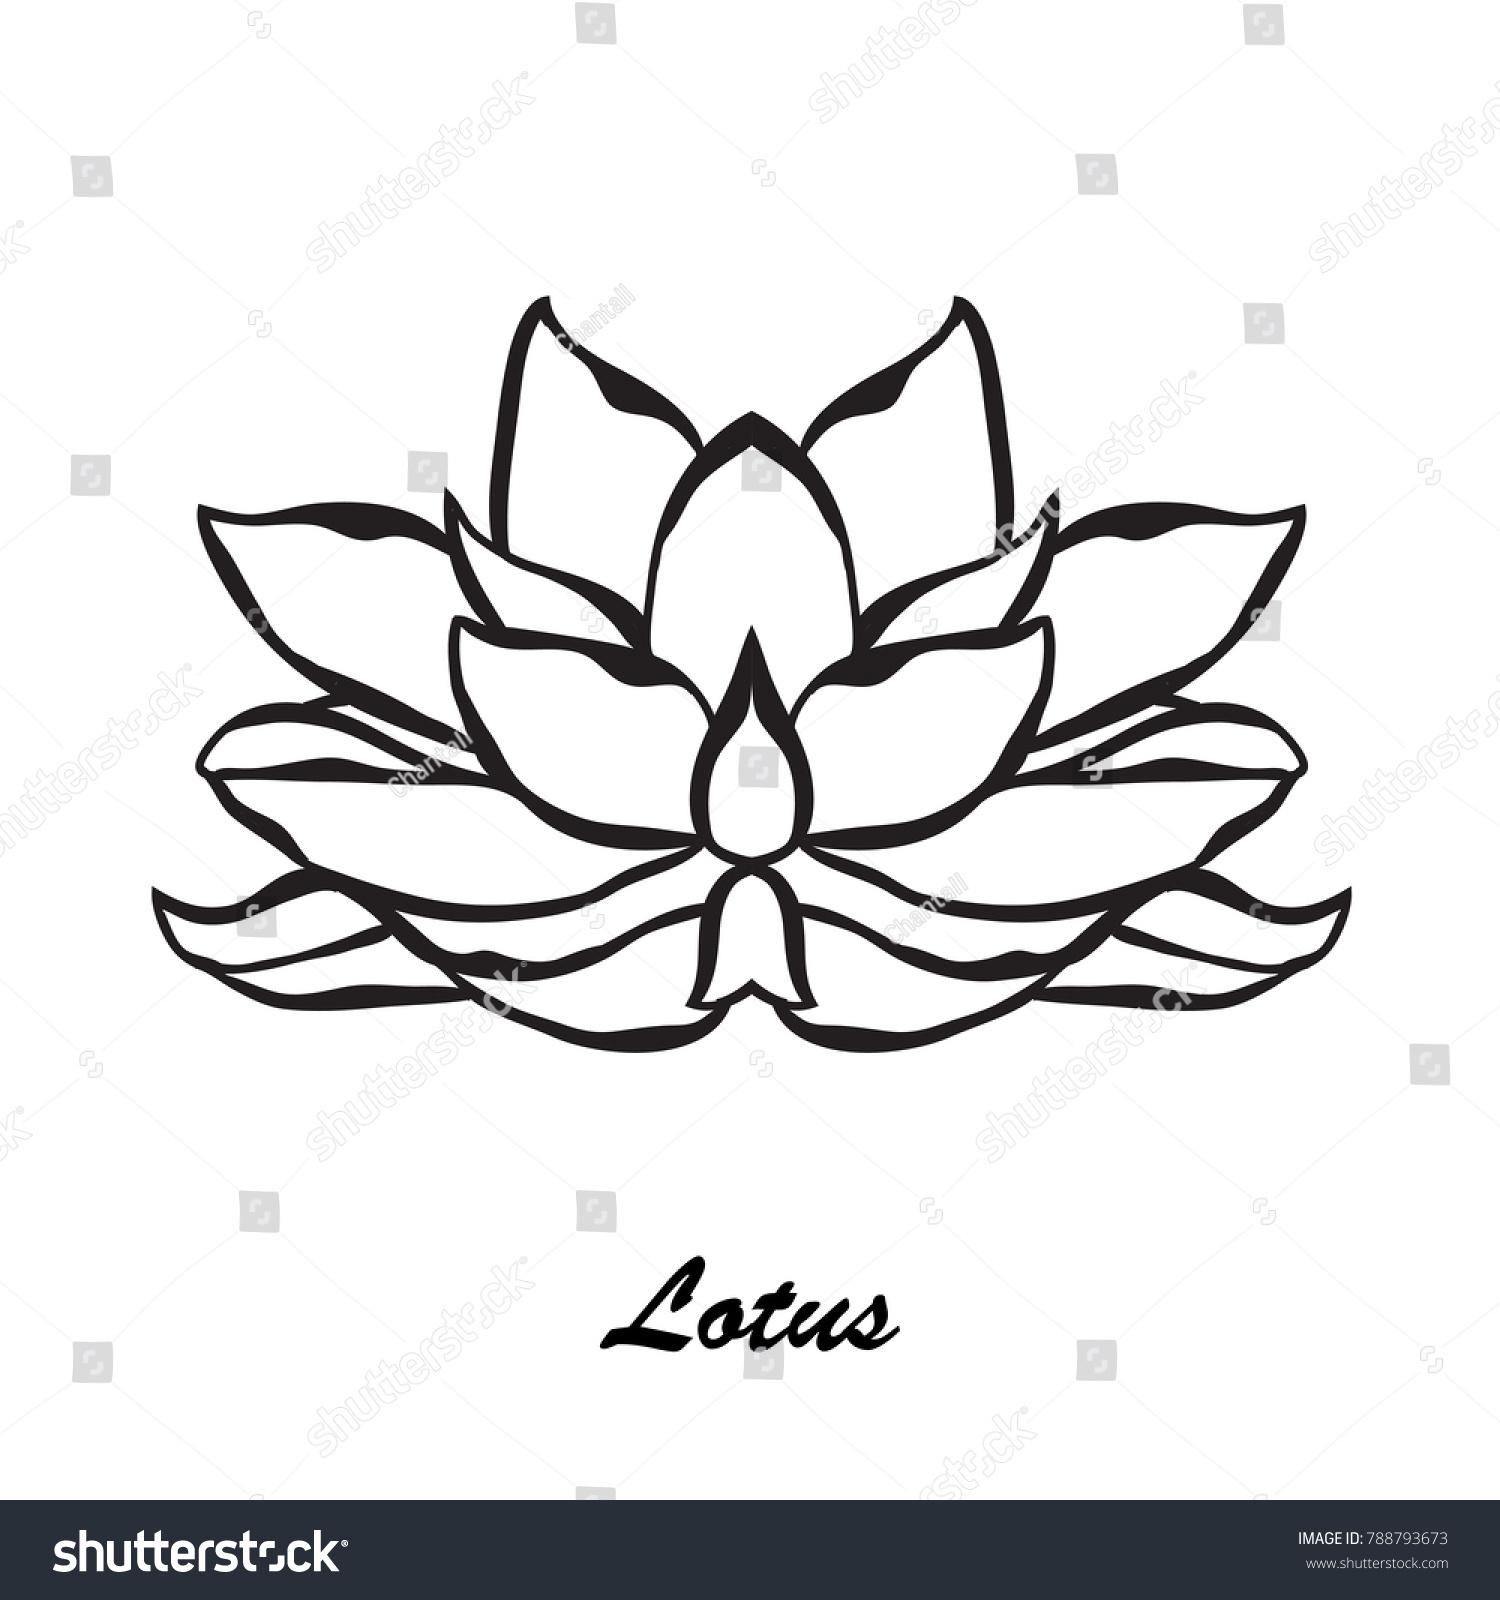 Elegant hand drawn lotus flower design stock vector 788793673 elegant hand drawn lotus flower design element floral decoration for cards invitations of izmirmasajfo